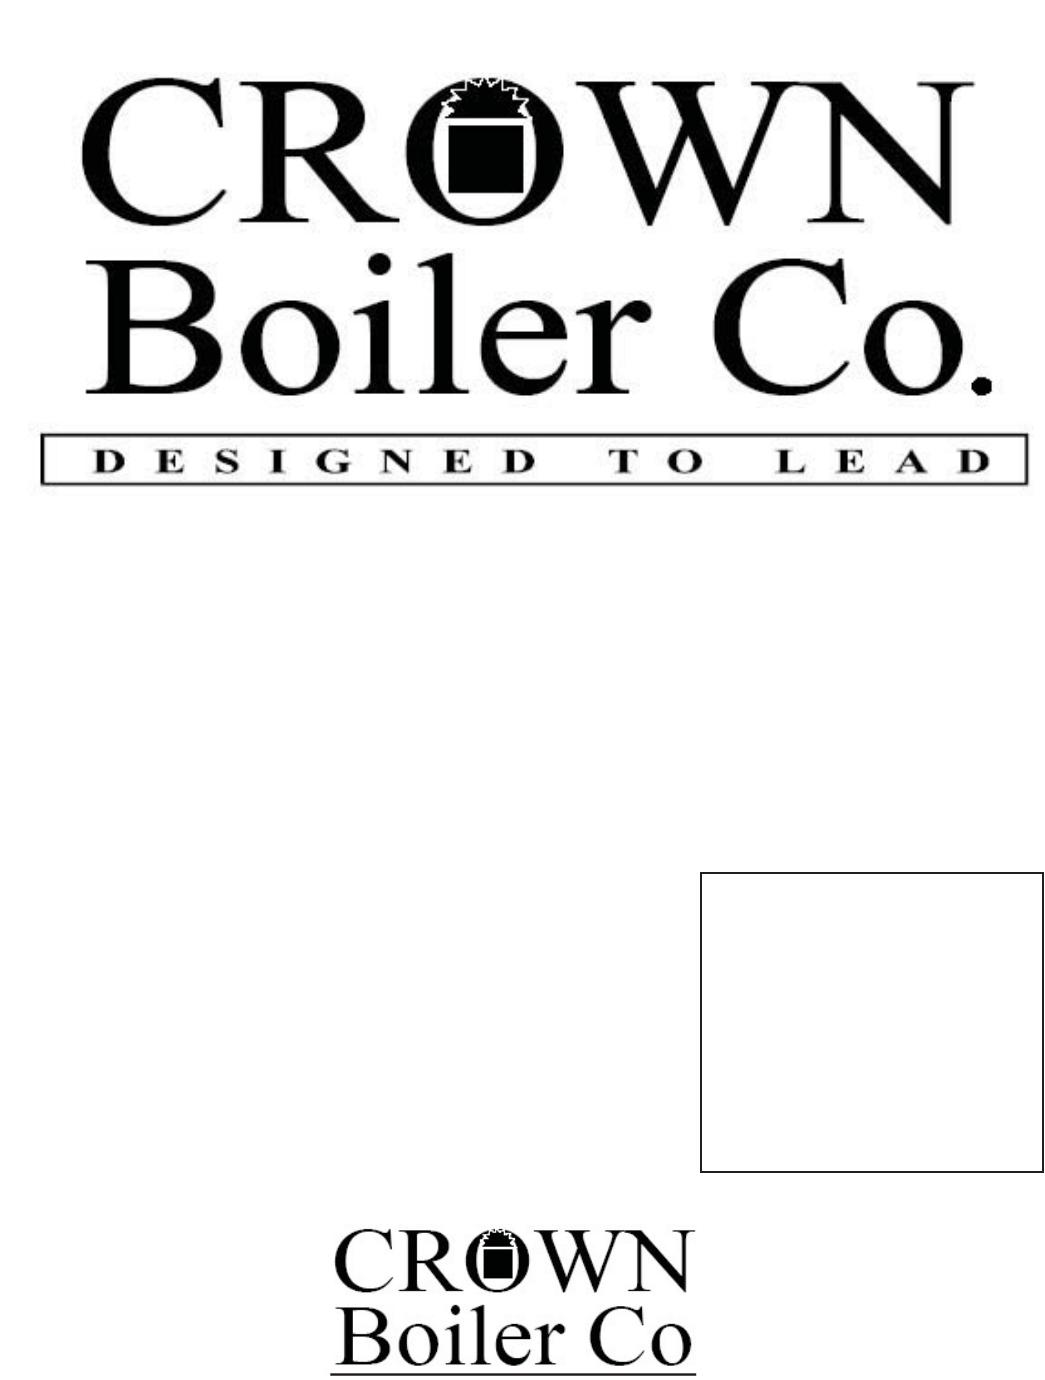 Crown Boiler Cwd060 Cwd083 Cwd110 Cwd138 Cwd165 Cwd193 Cwd220 Cwd245 Installation